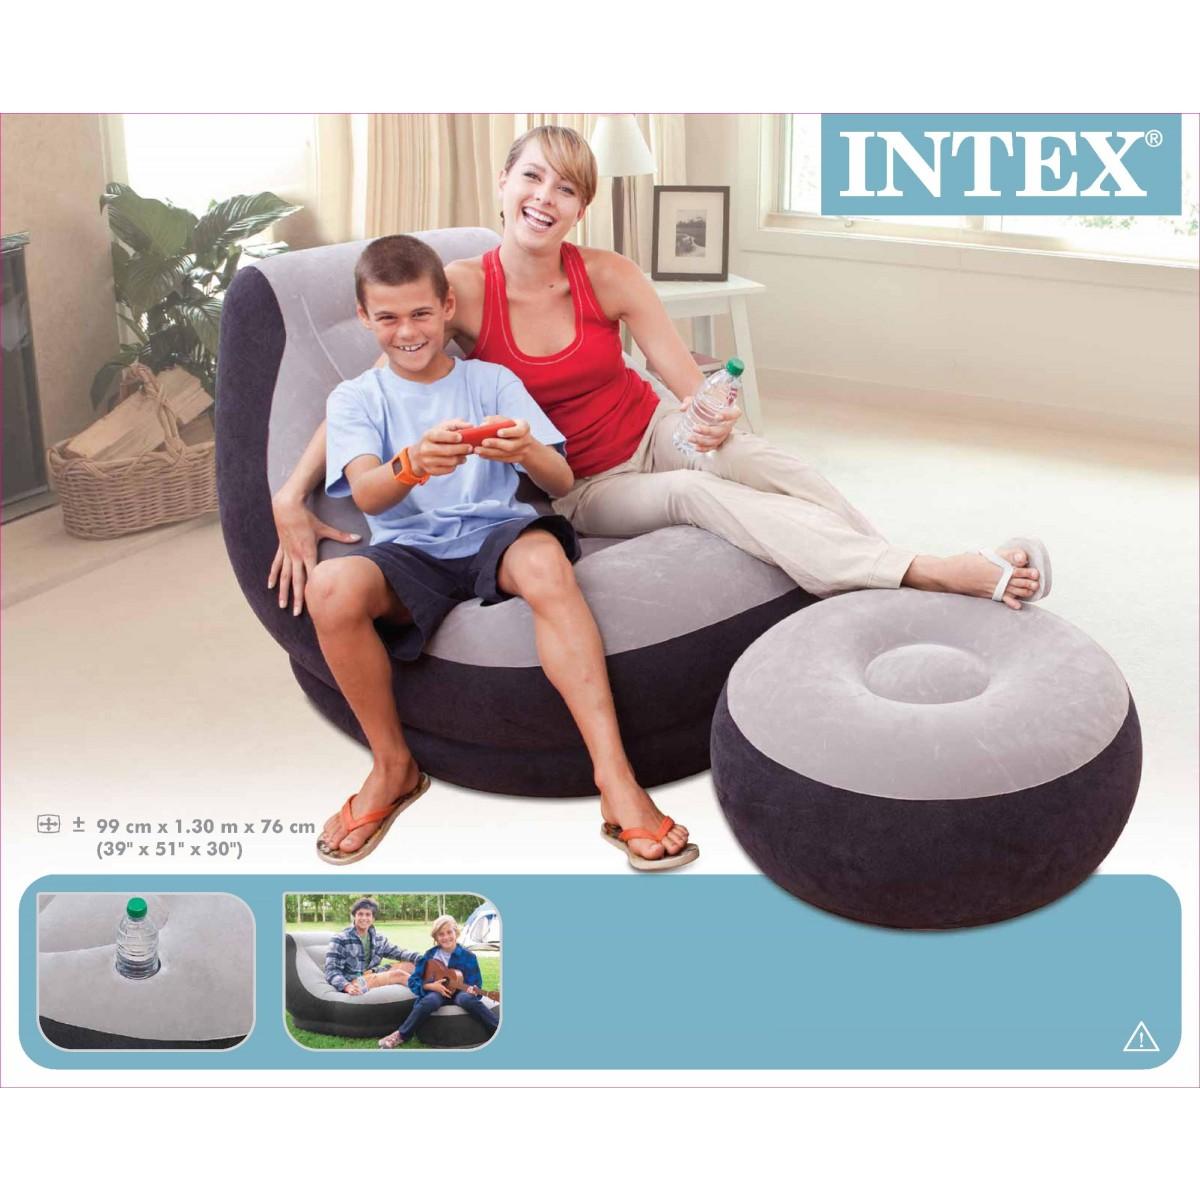 Intex Ultra Lounge Chair Set - £16.50 @ Tesco Direct